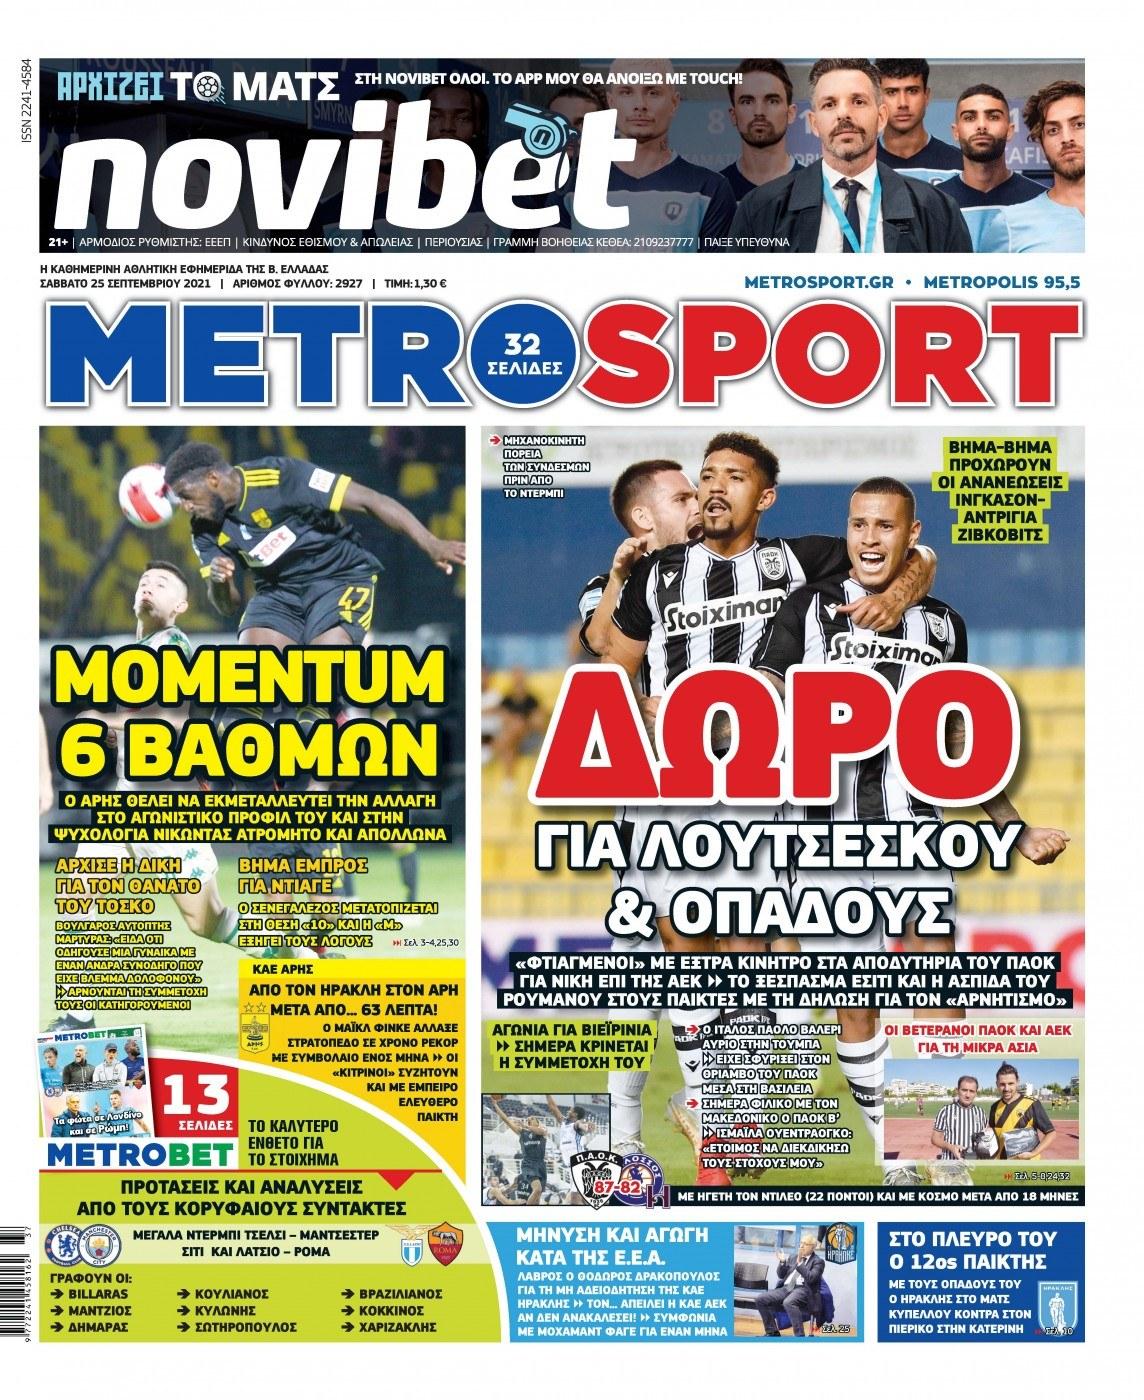 Metrosport 25.9